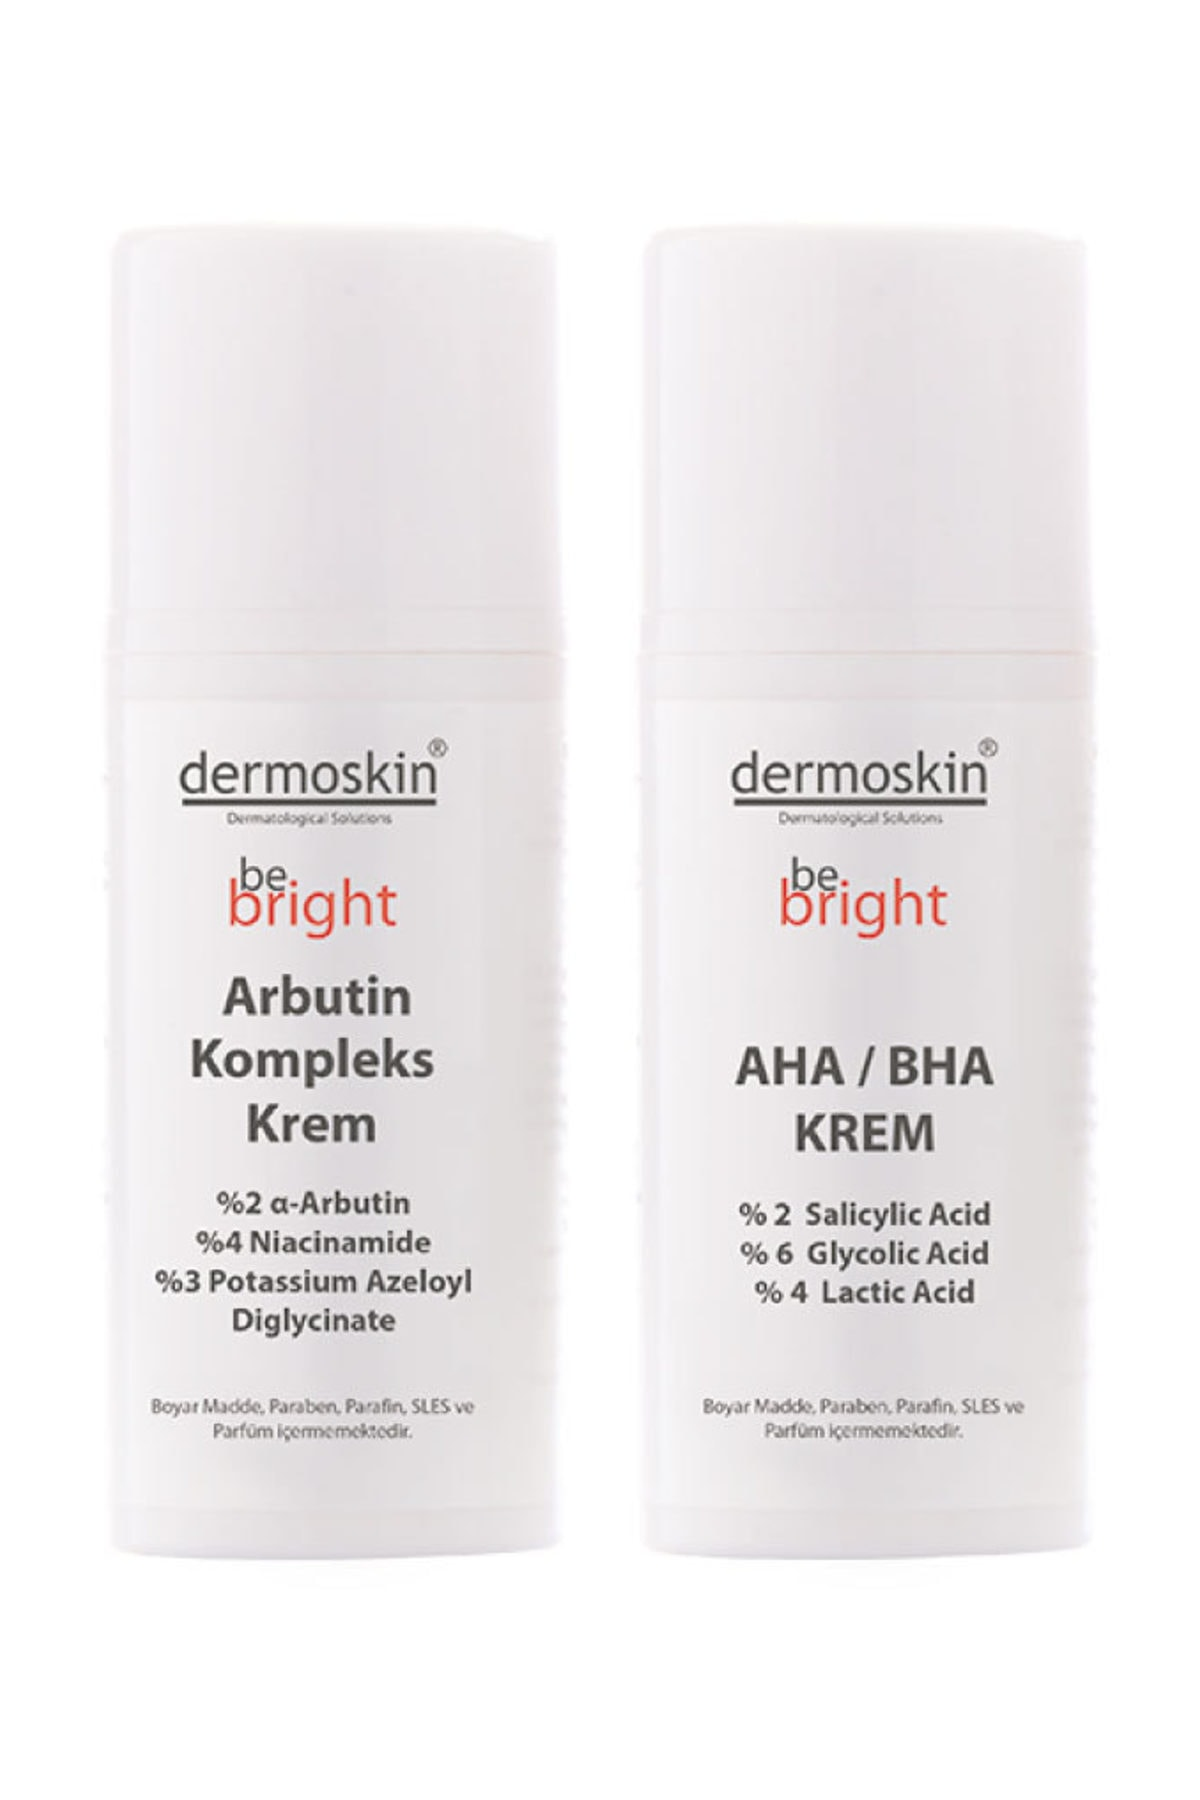 Dermoskin Be Bright   Lekeli Ciltlere Özel  Arbutin Kompleks Krem 33 ml + Be Bright AHA BHA Krem 33 ml 1